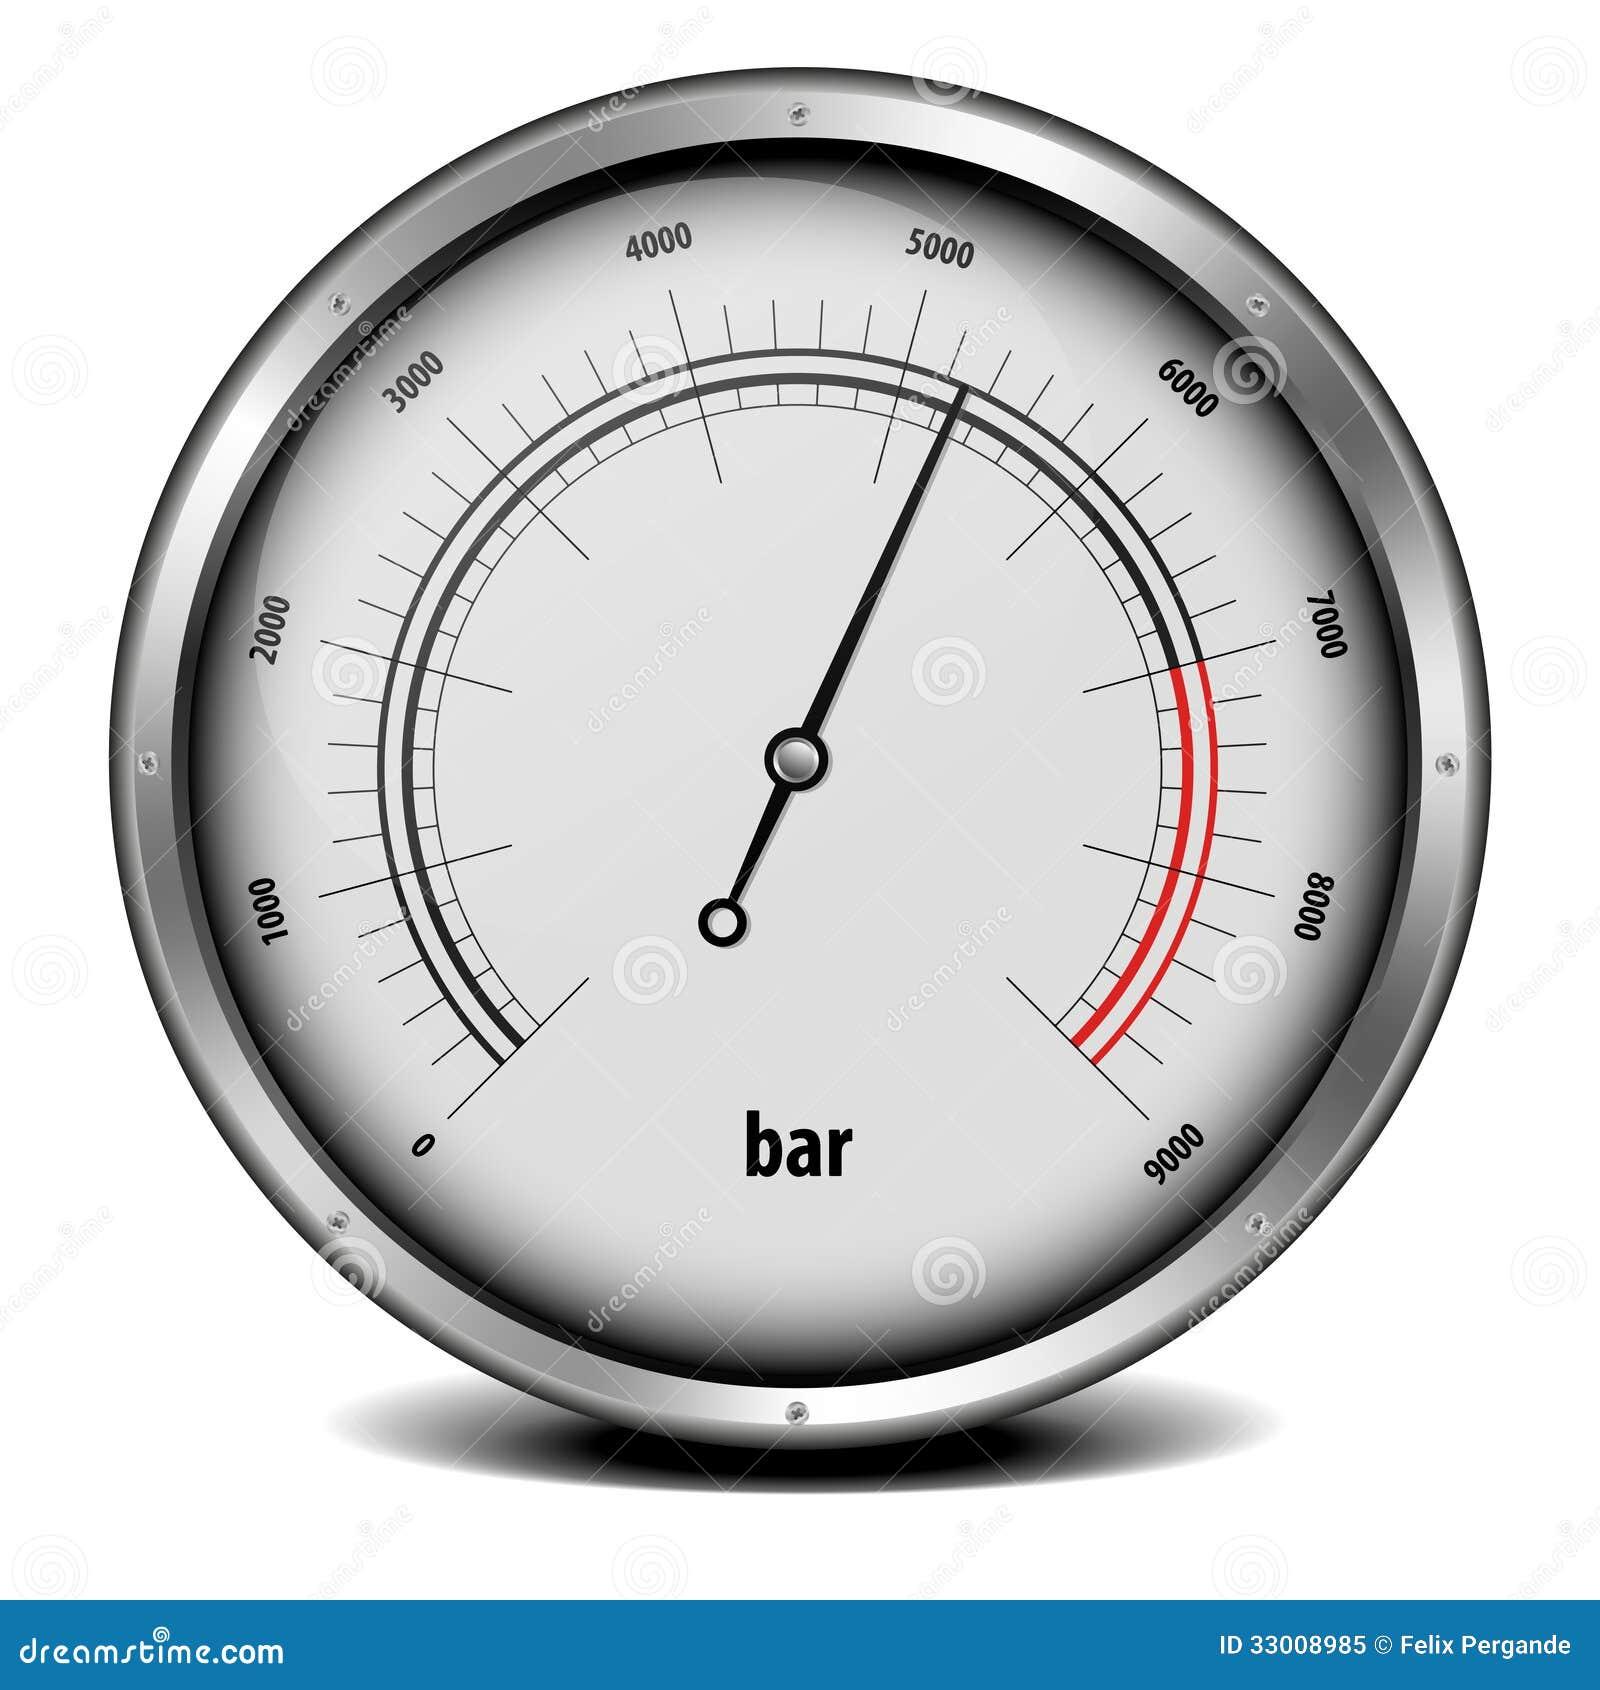 Meter Clip Art : Pressure meter royalty free stock photo image